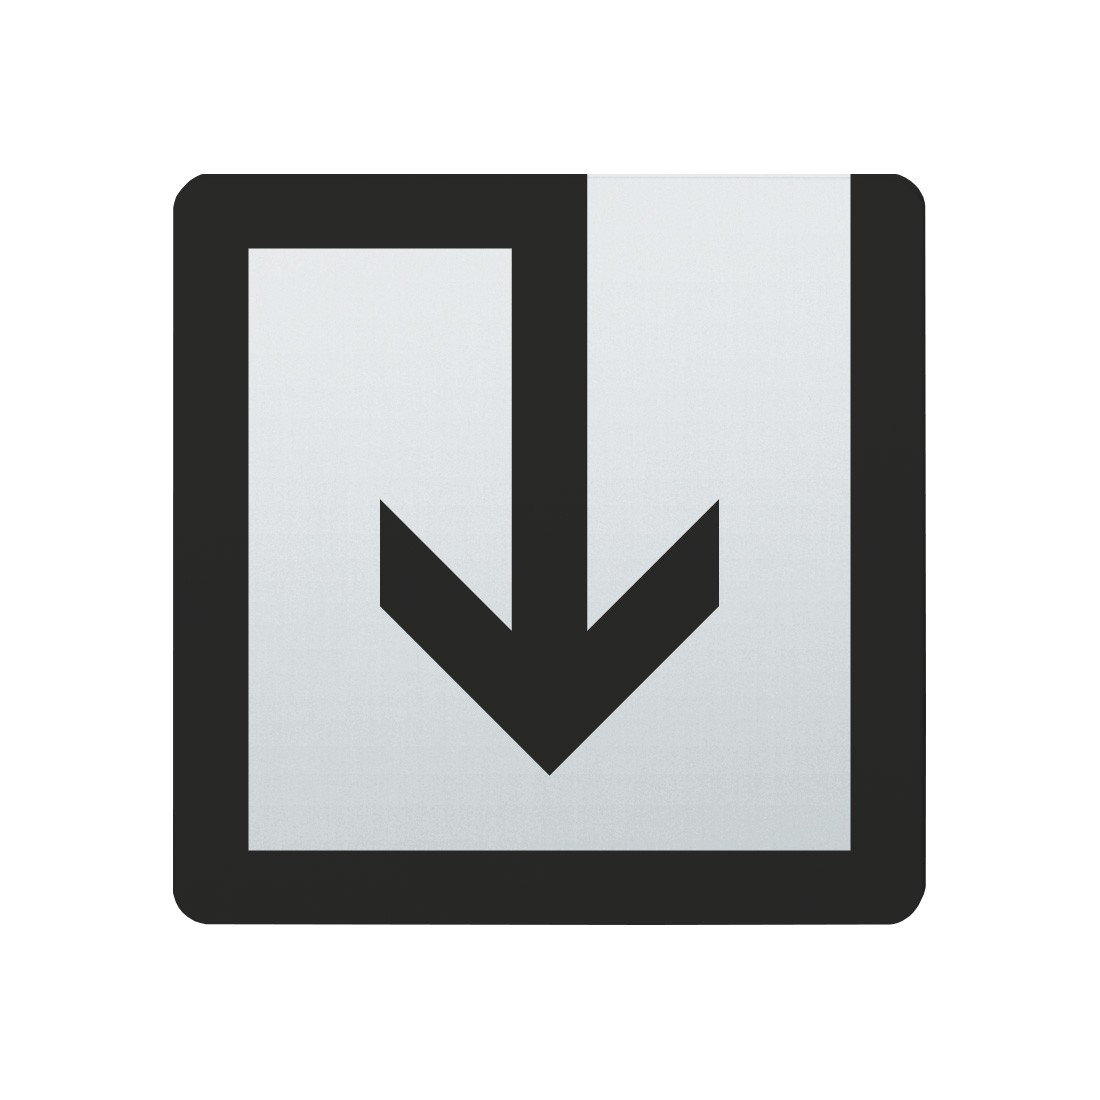 FSB Hinweiszeichen Abfall Lasergraviert Edelstahl fein matt (0 36 4059 00040 6204)